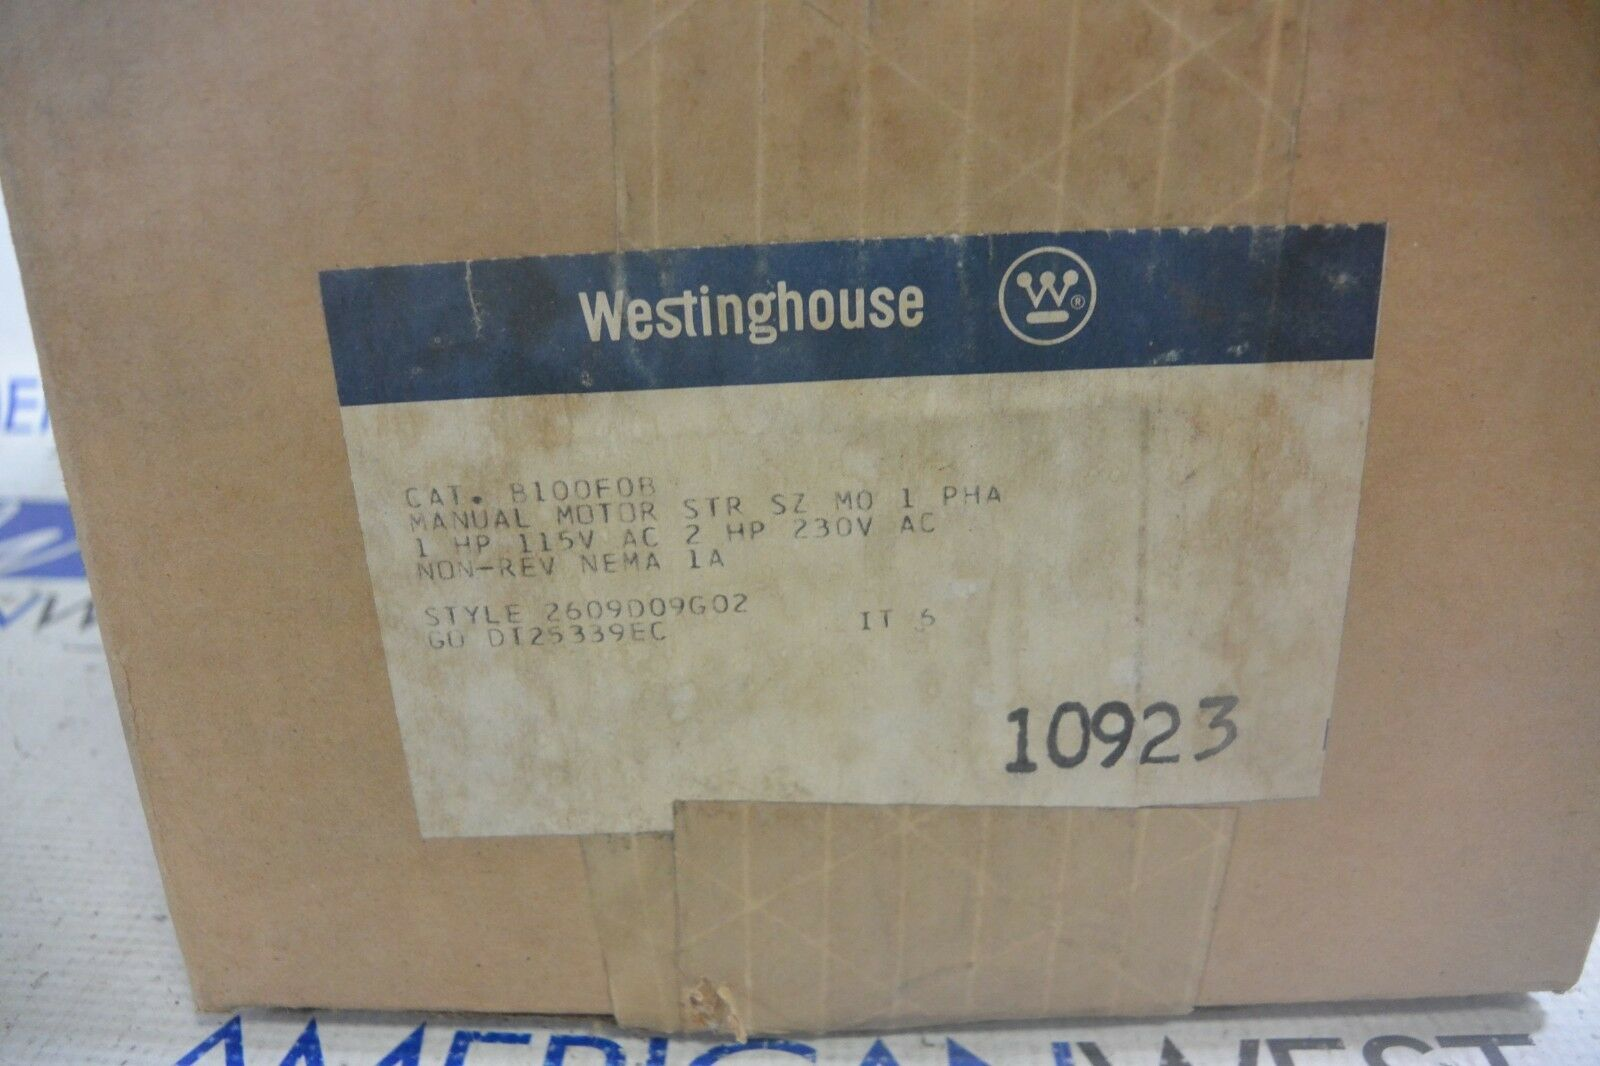 Nuevo Manual Motor De Arranque Westinghouse B100F0B M01 2HP 230V 230V 230V 2609D09G02 fbfcaa